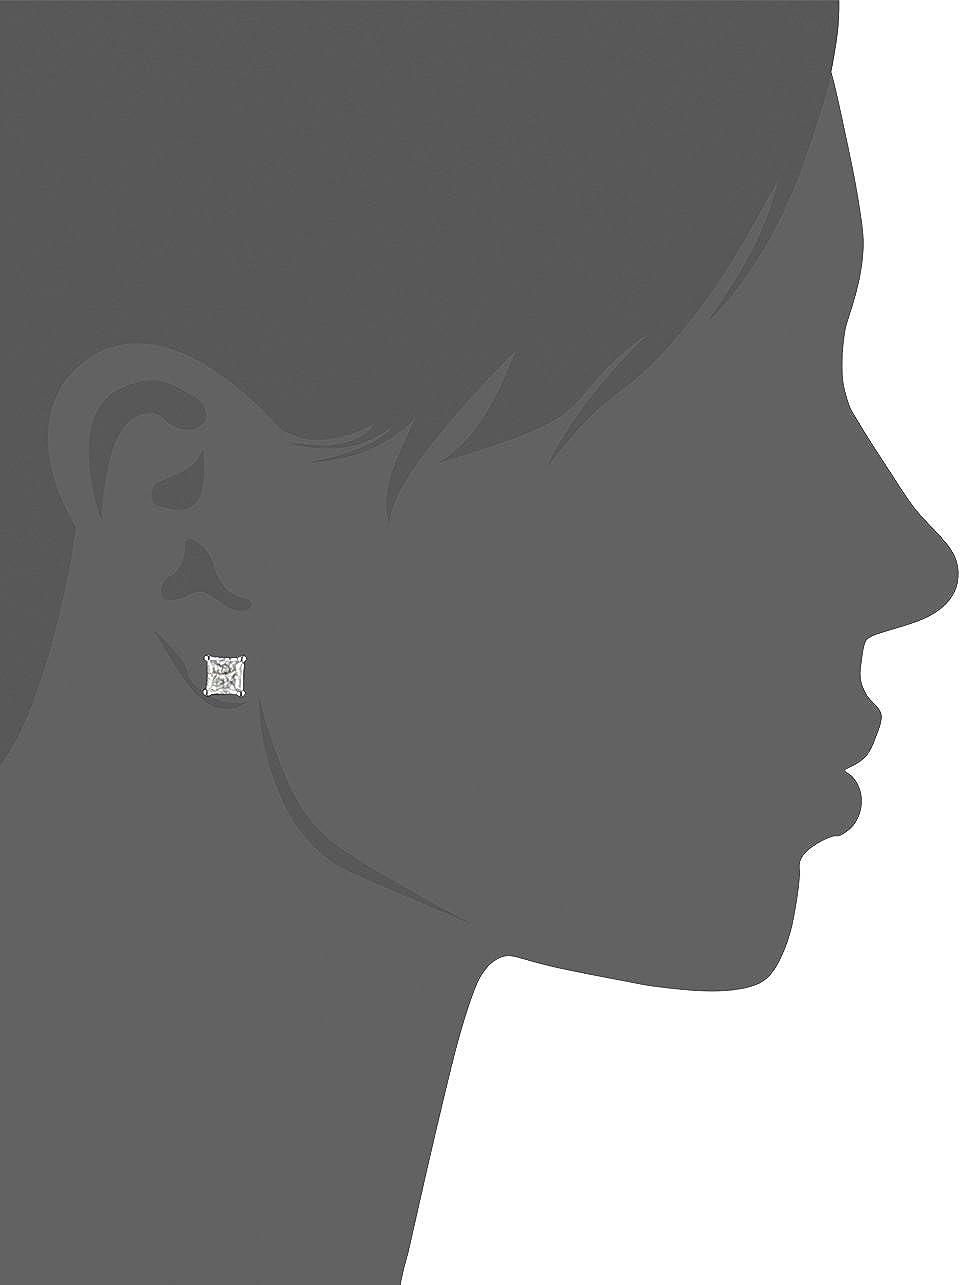 IGI Certified Platinum, Princess-Cut, Diamond 4-Prong Stud Earrings 2 cttw, G-H Color, VS2 Clarity